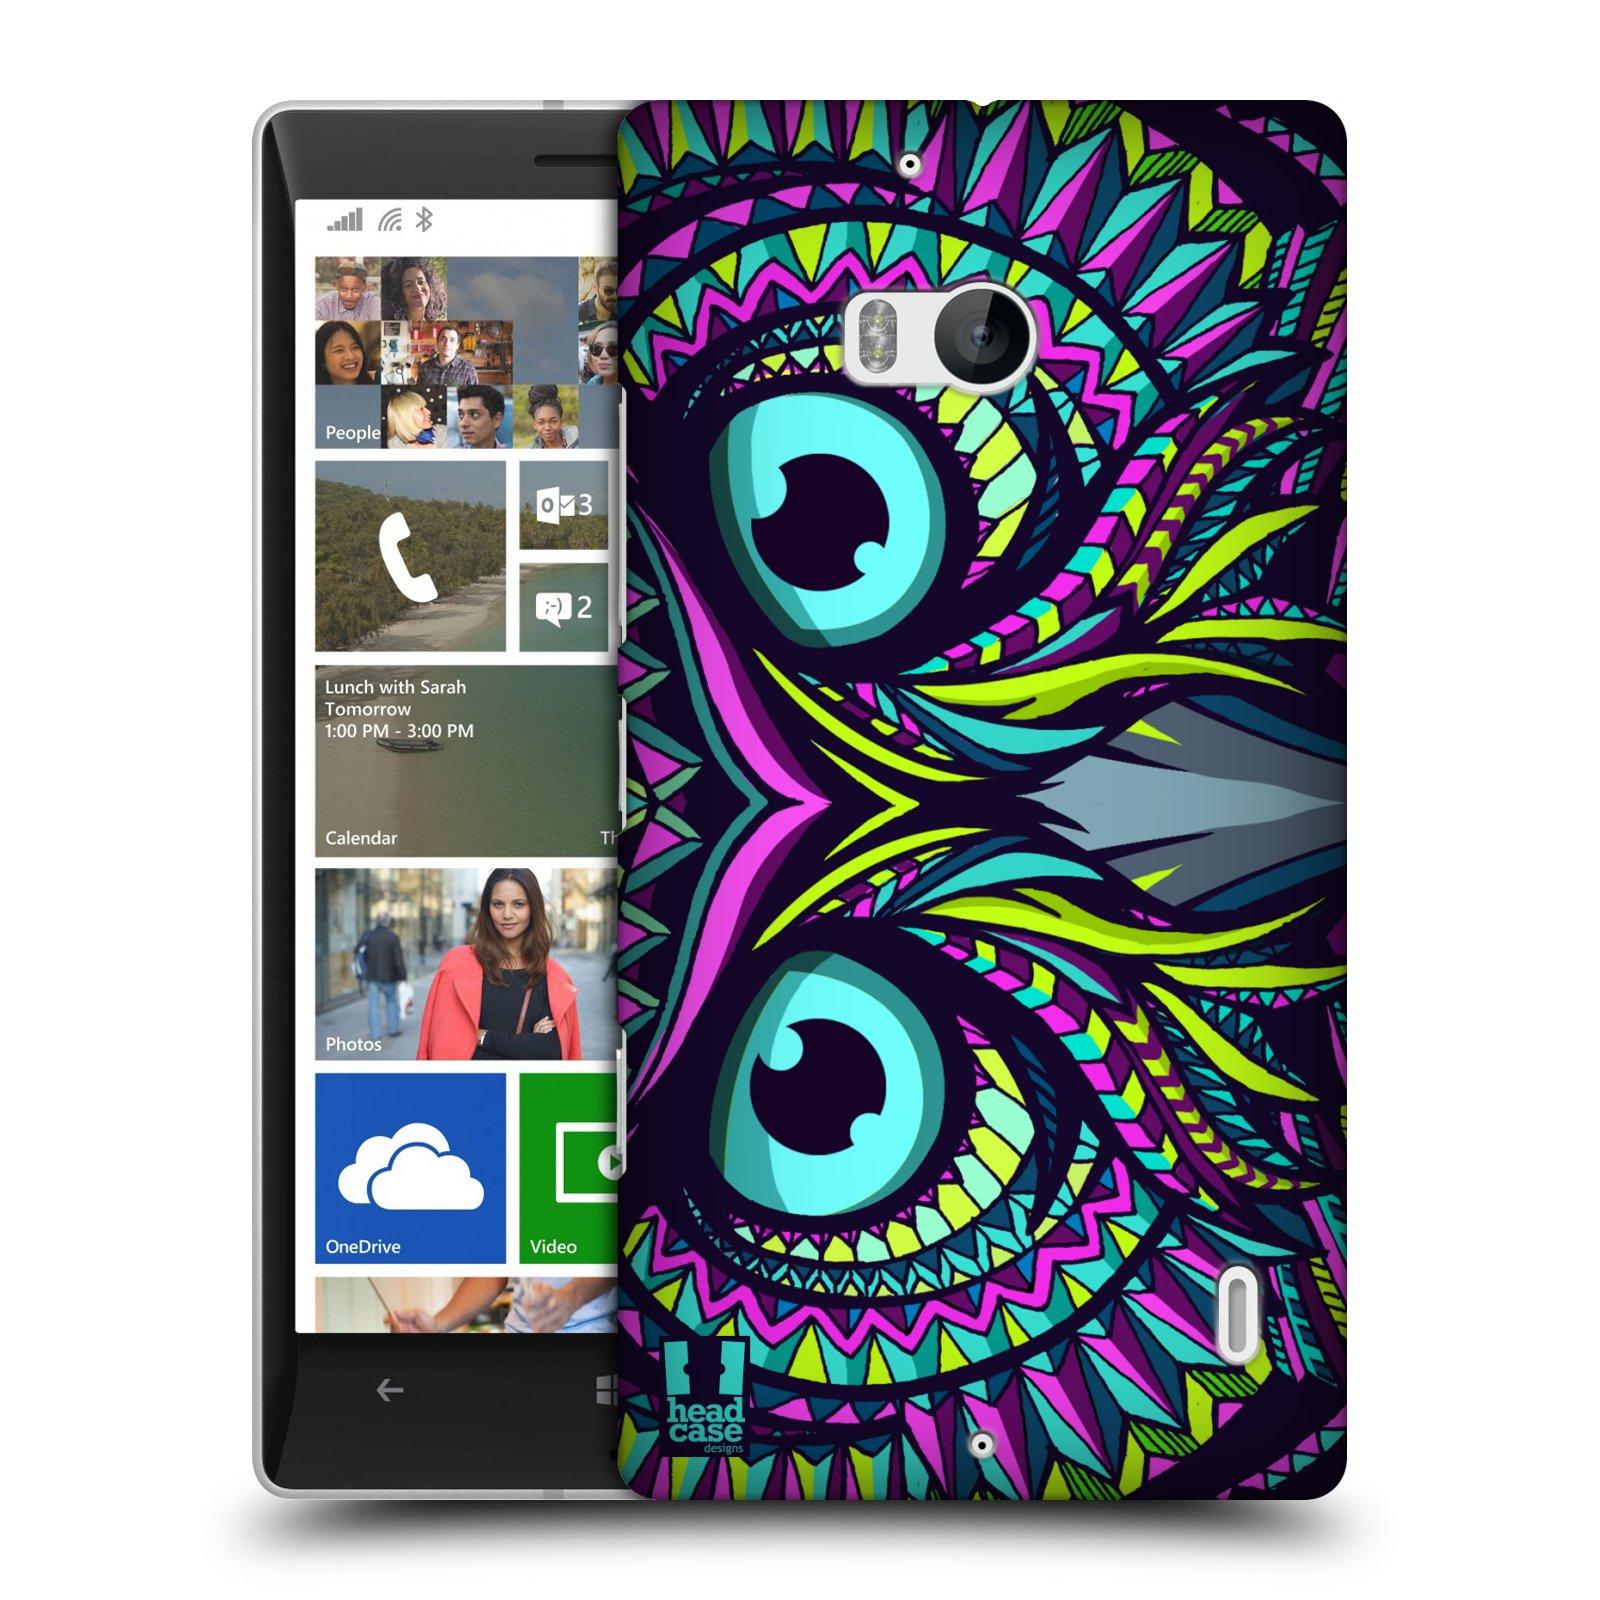 Plastové pouzdro na mobil Nokia Lumia 930 HEAD CASE AZTEC SOVA (Kryt či obal na mobilní telefon Nokia Lumia 930)